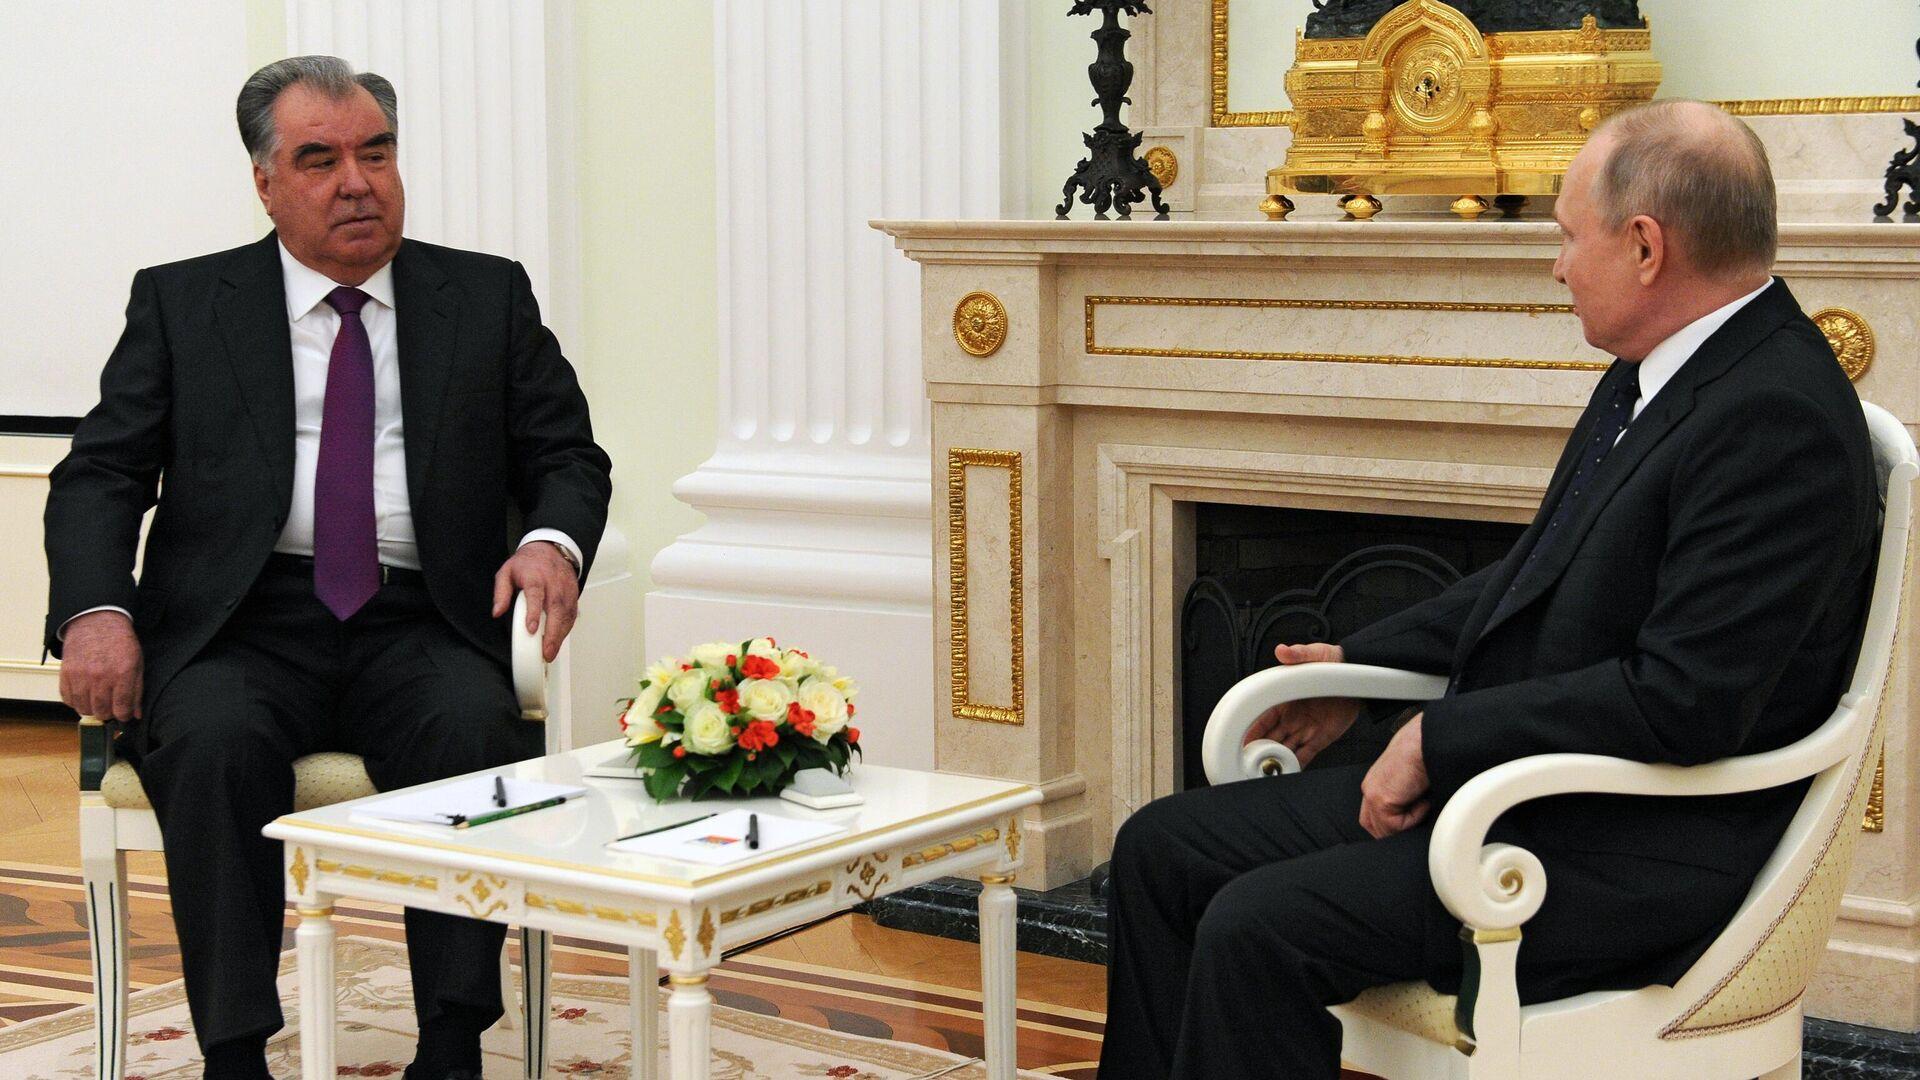 Президент РФ Владимир Путин и президент Таджикистана Эмомали Рахмон во время встречи - РИА Новости, 1920, 19.05.2021